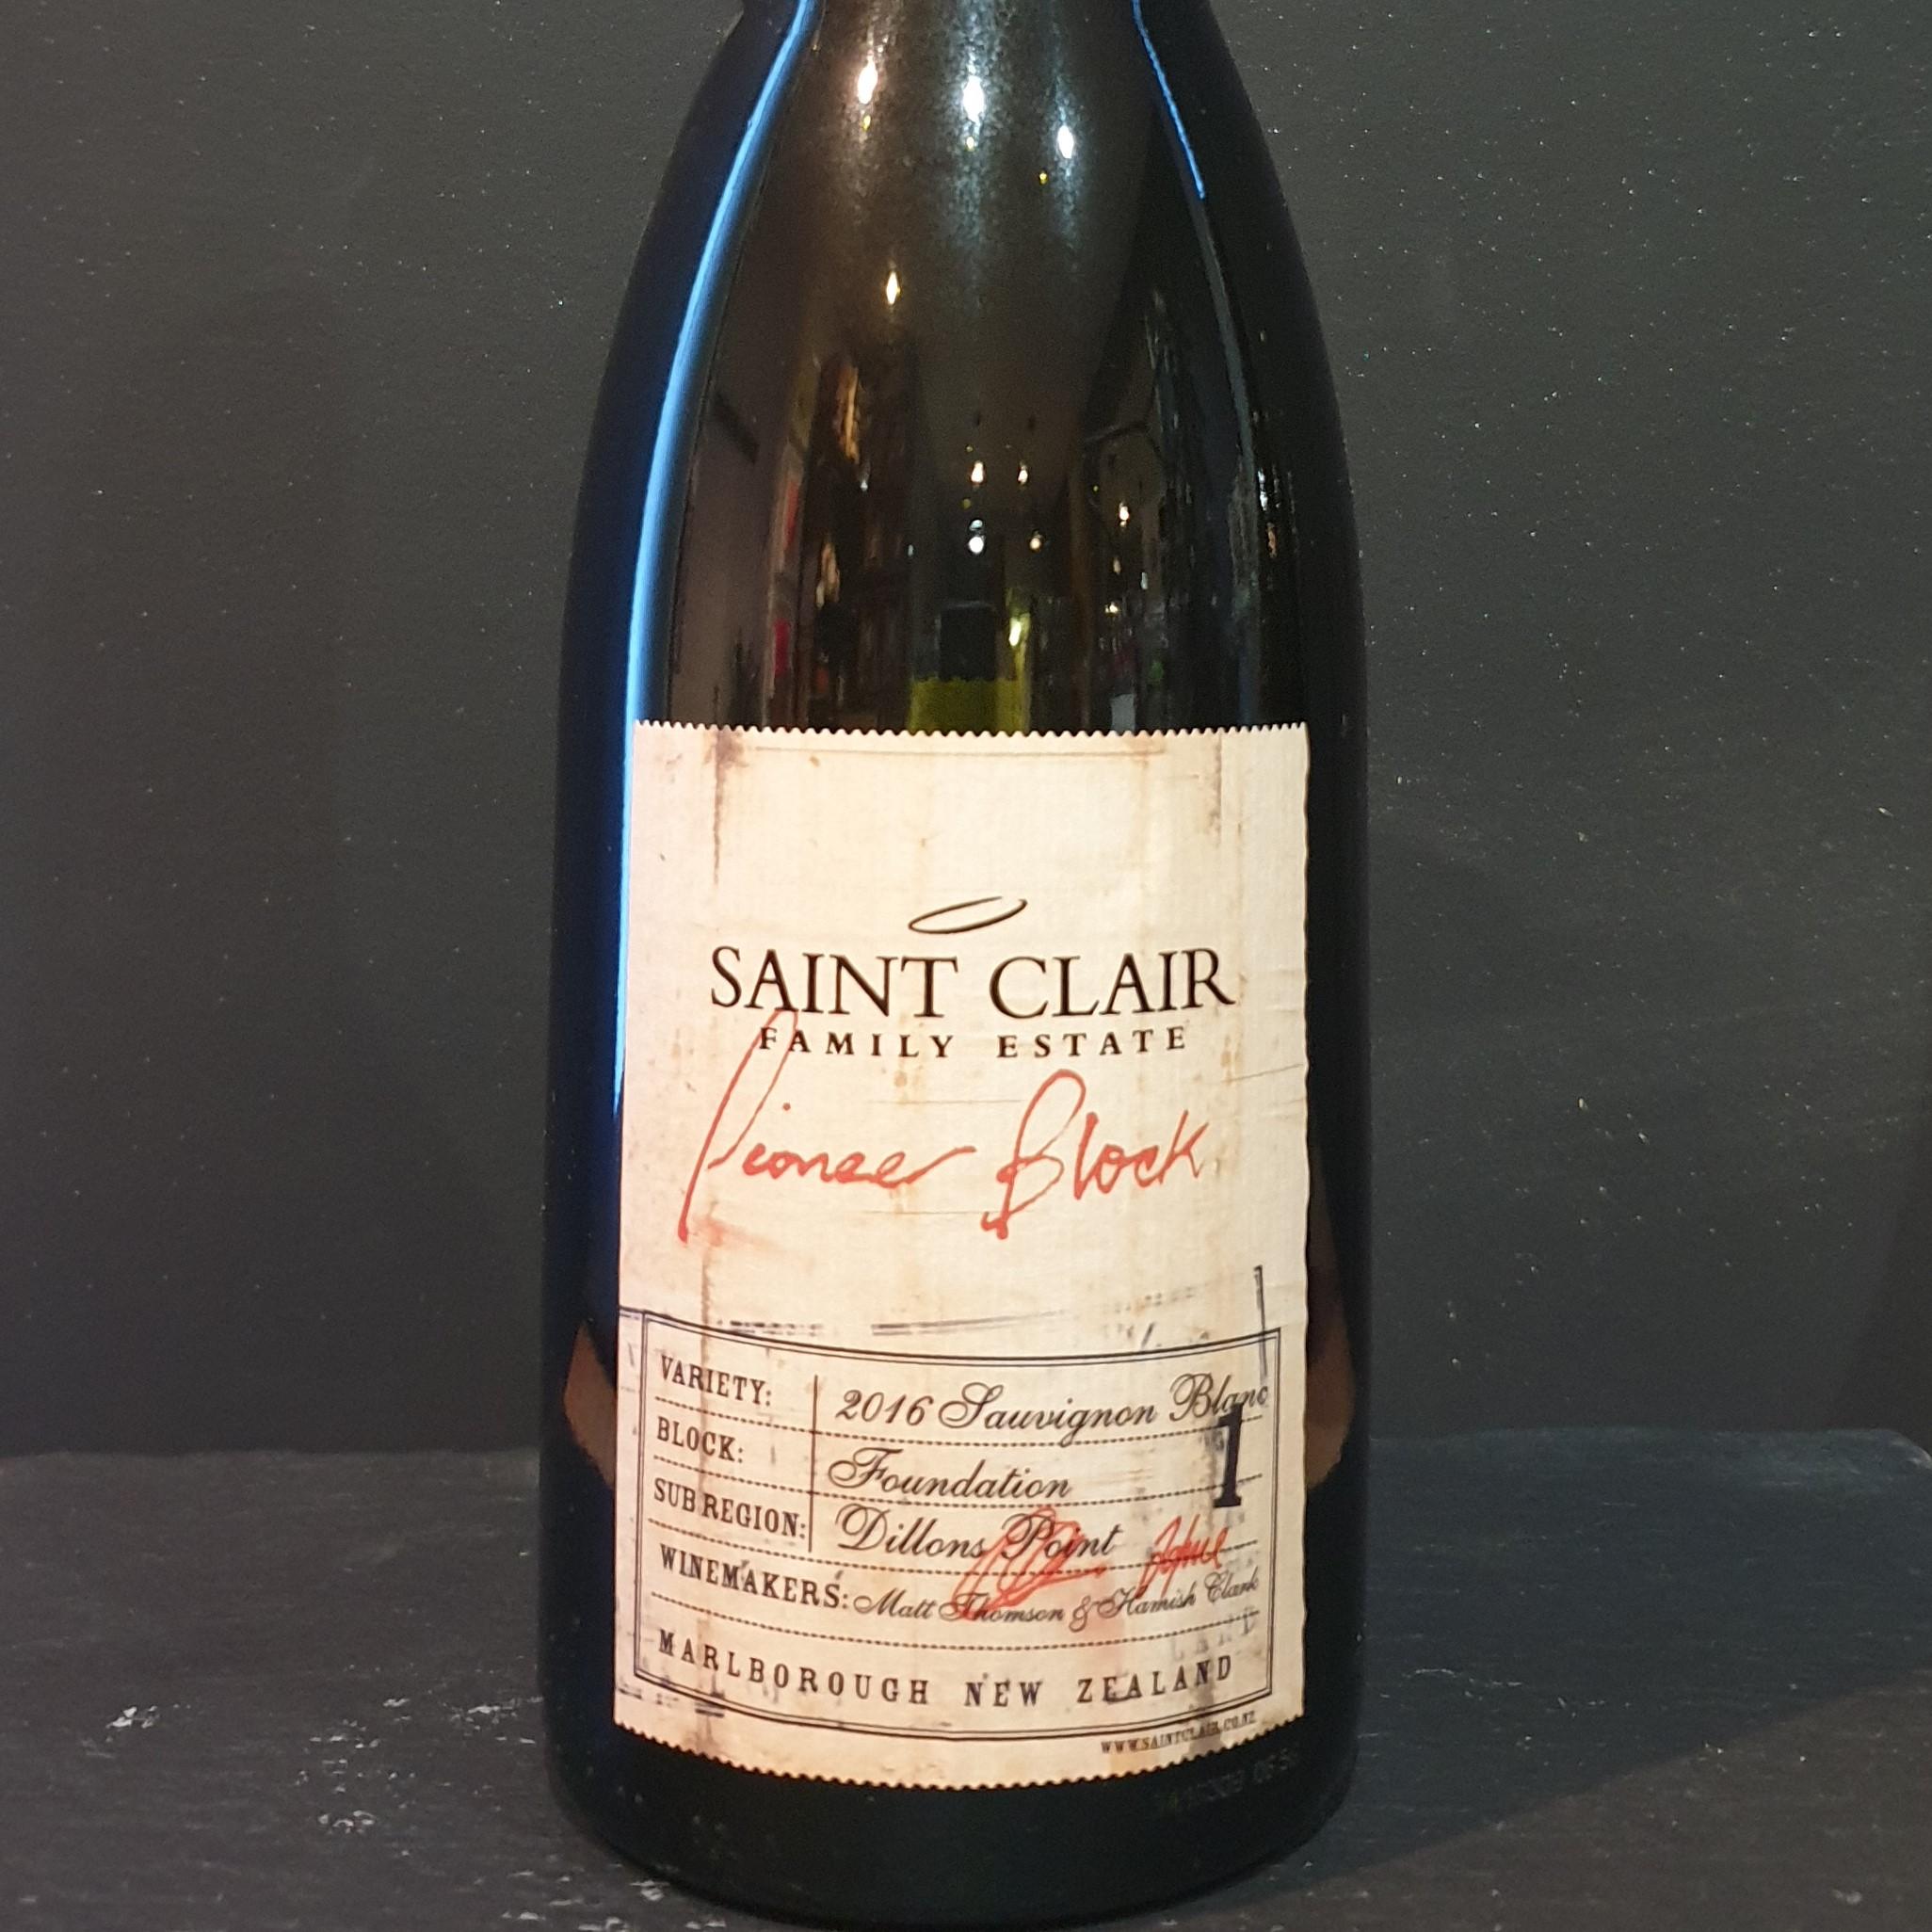 Saint Clair Pioneer Block 1 Foundation Sauvignon Blanc